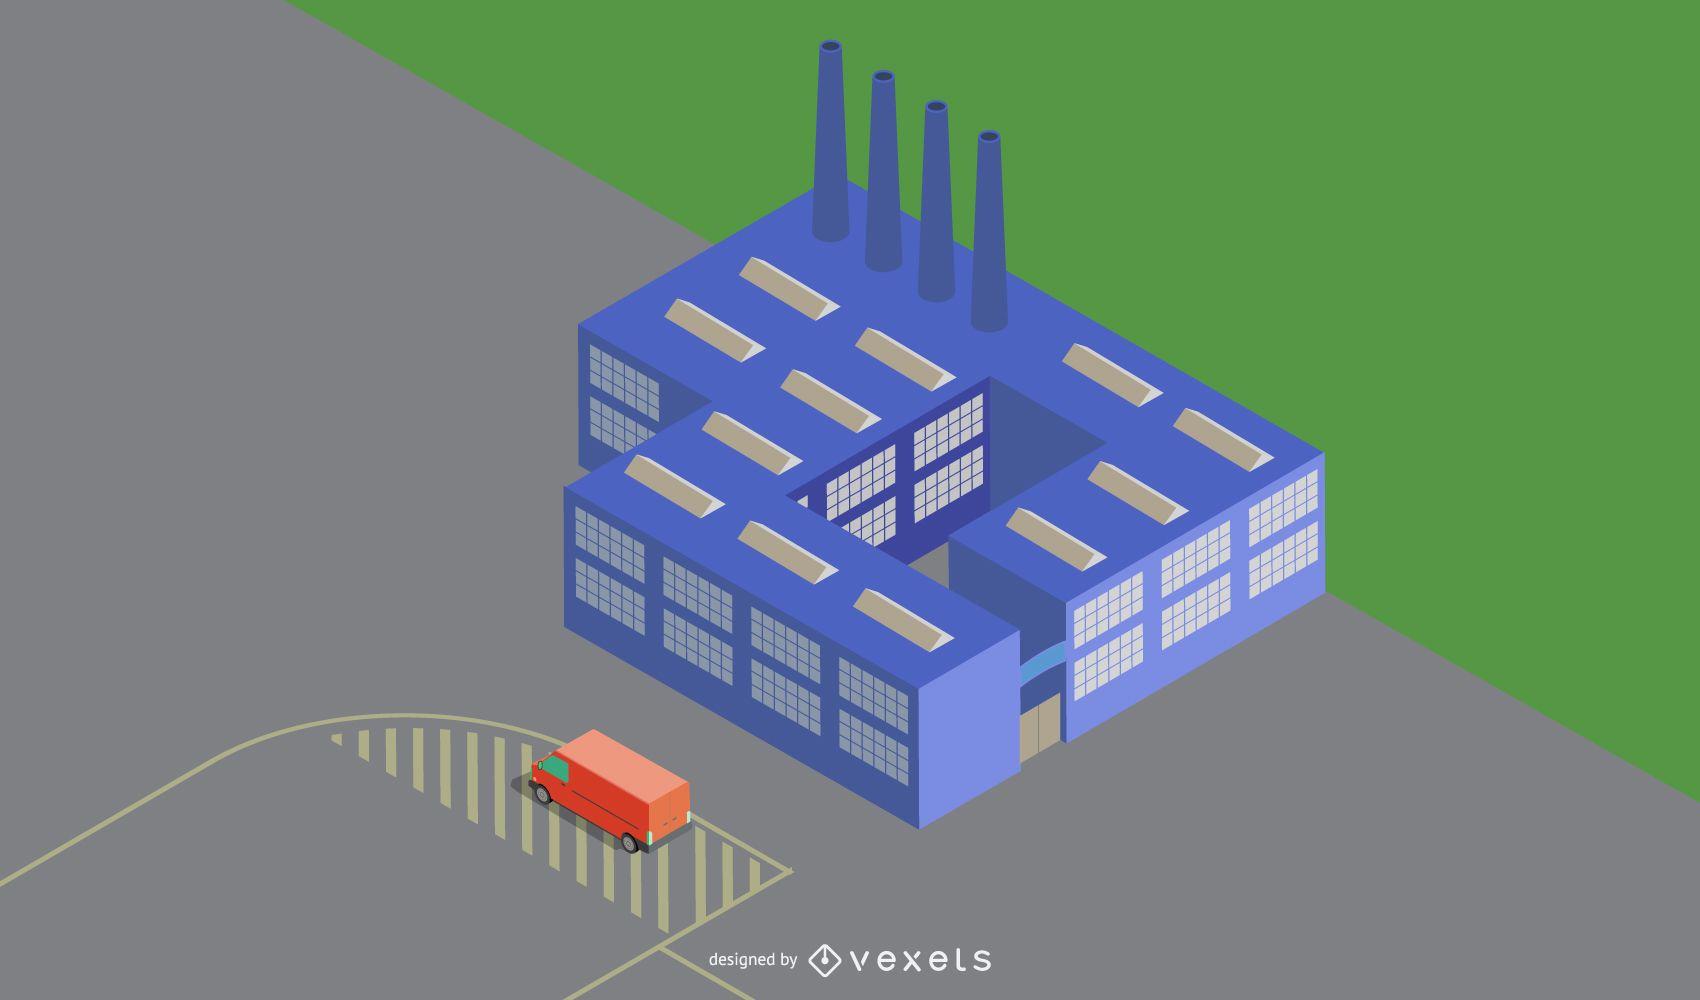 Diseño vectorial de edificios